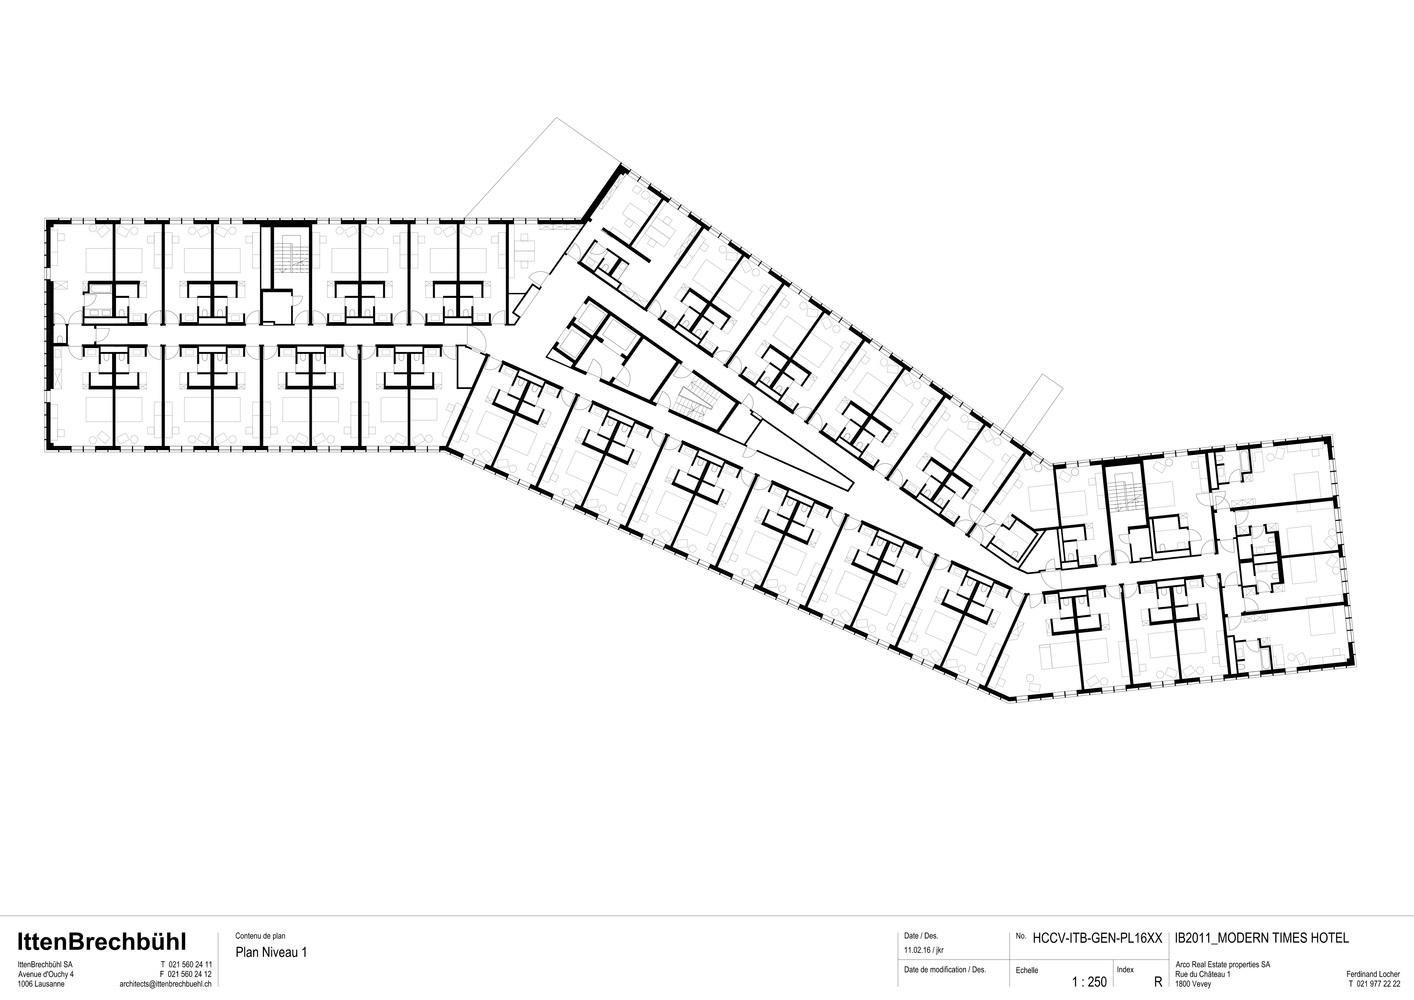 Gallery of modern times hotel itten brechb hl 24 for Modern site plan